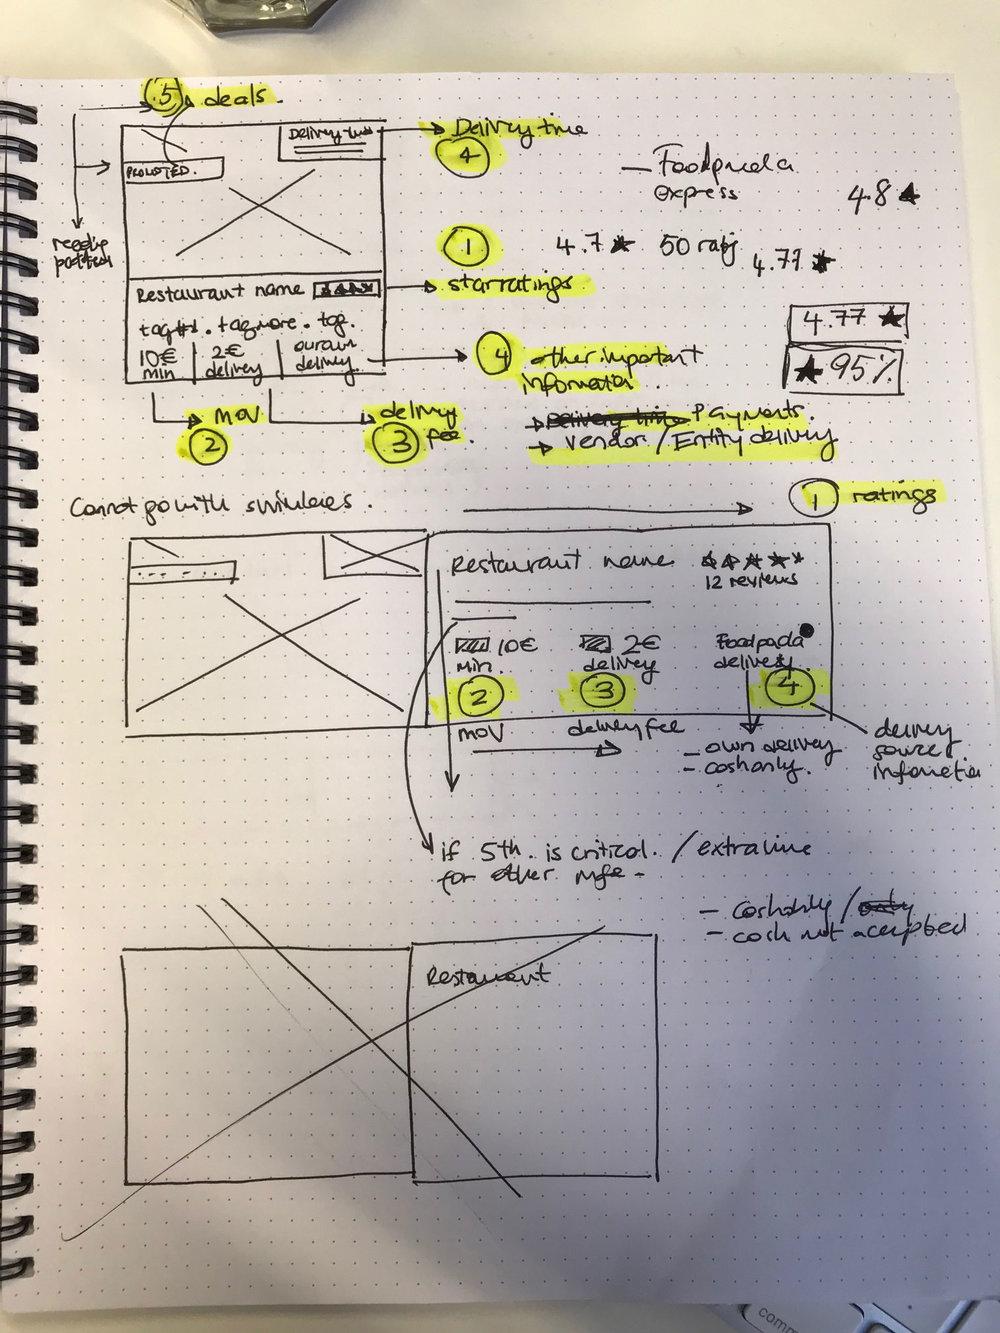 gvt_sketch_4.jpg